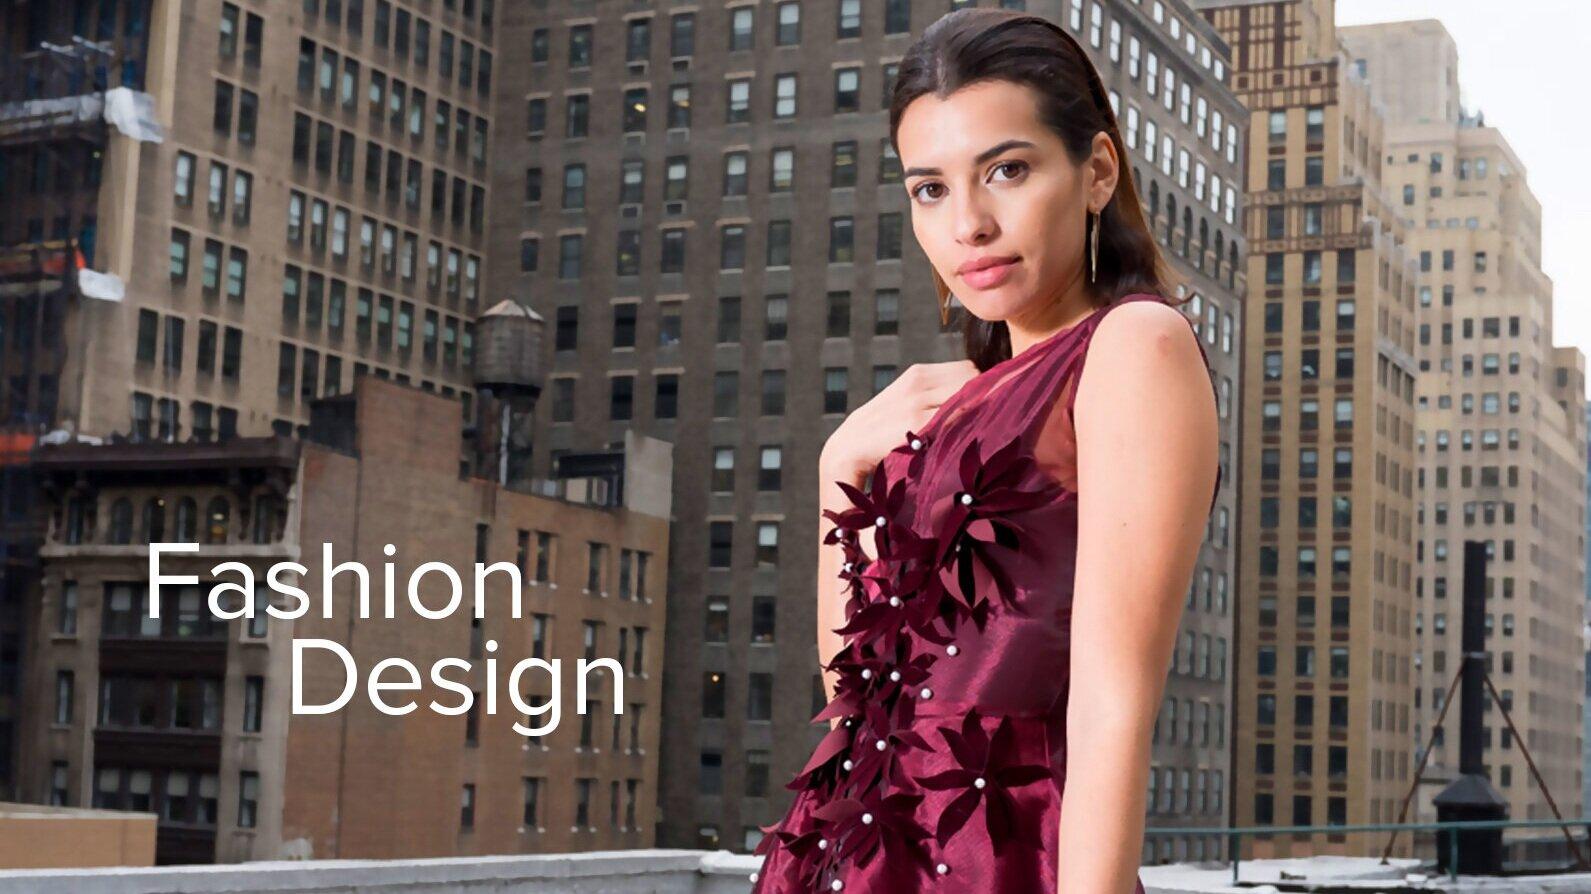 FashionDesign921.jpg